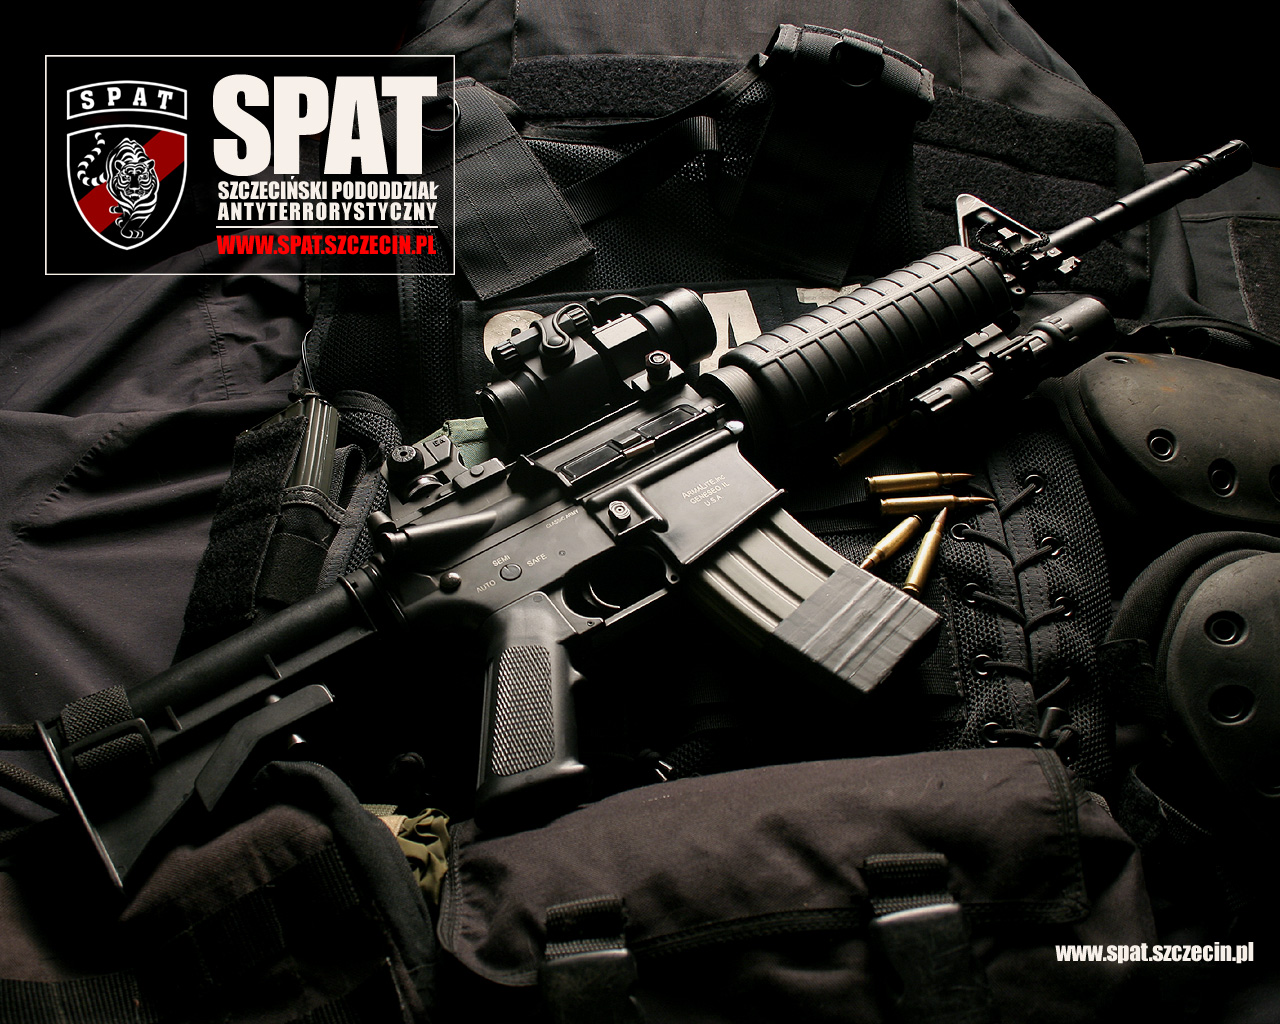 M-16 карабин, автоматическая винтовка, wallpaper weapons SPAT, SWAT, обои, оружие